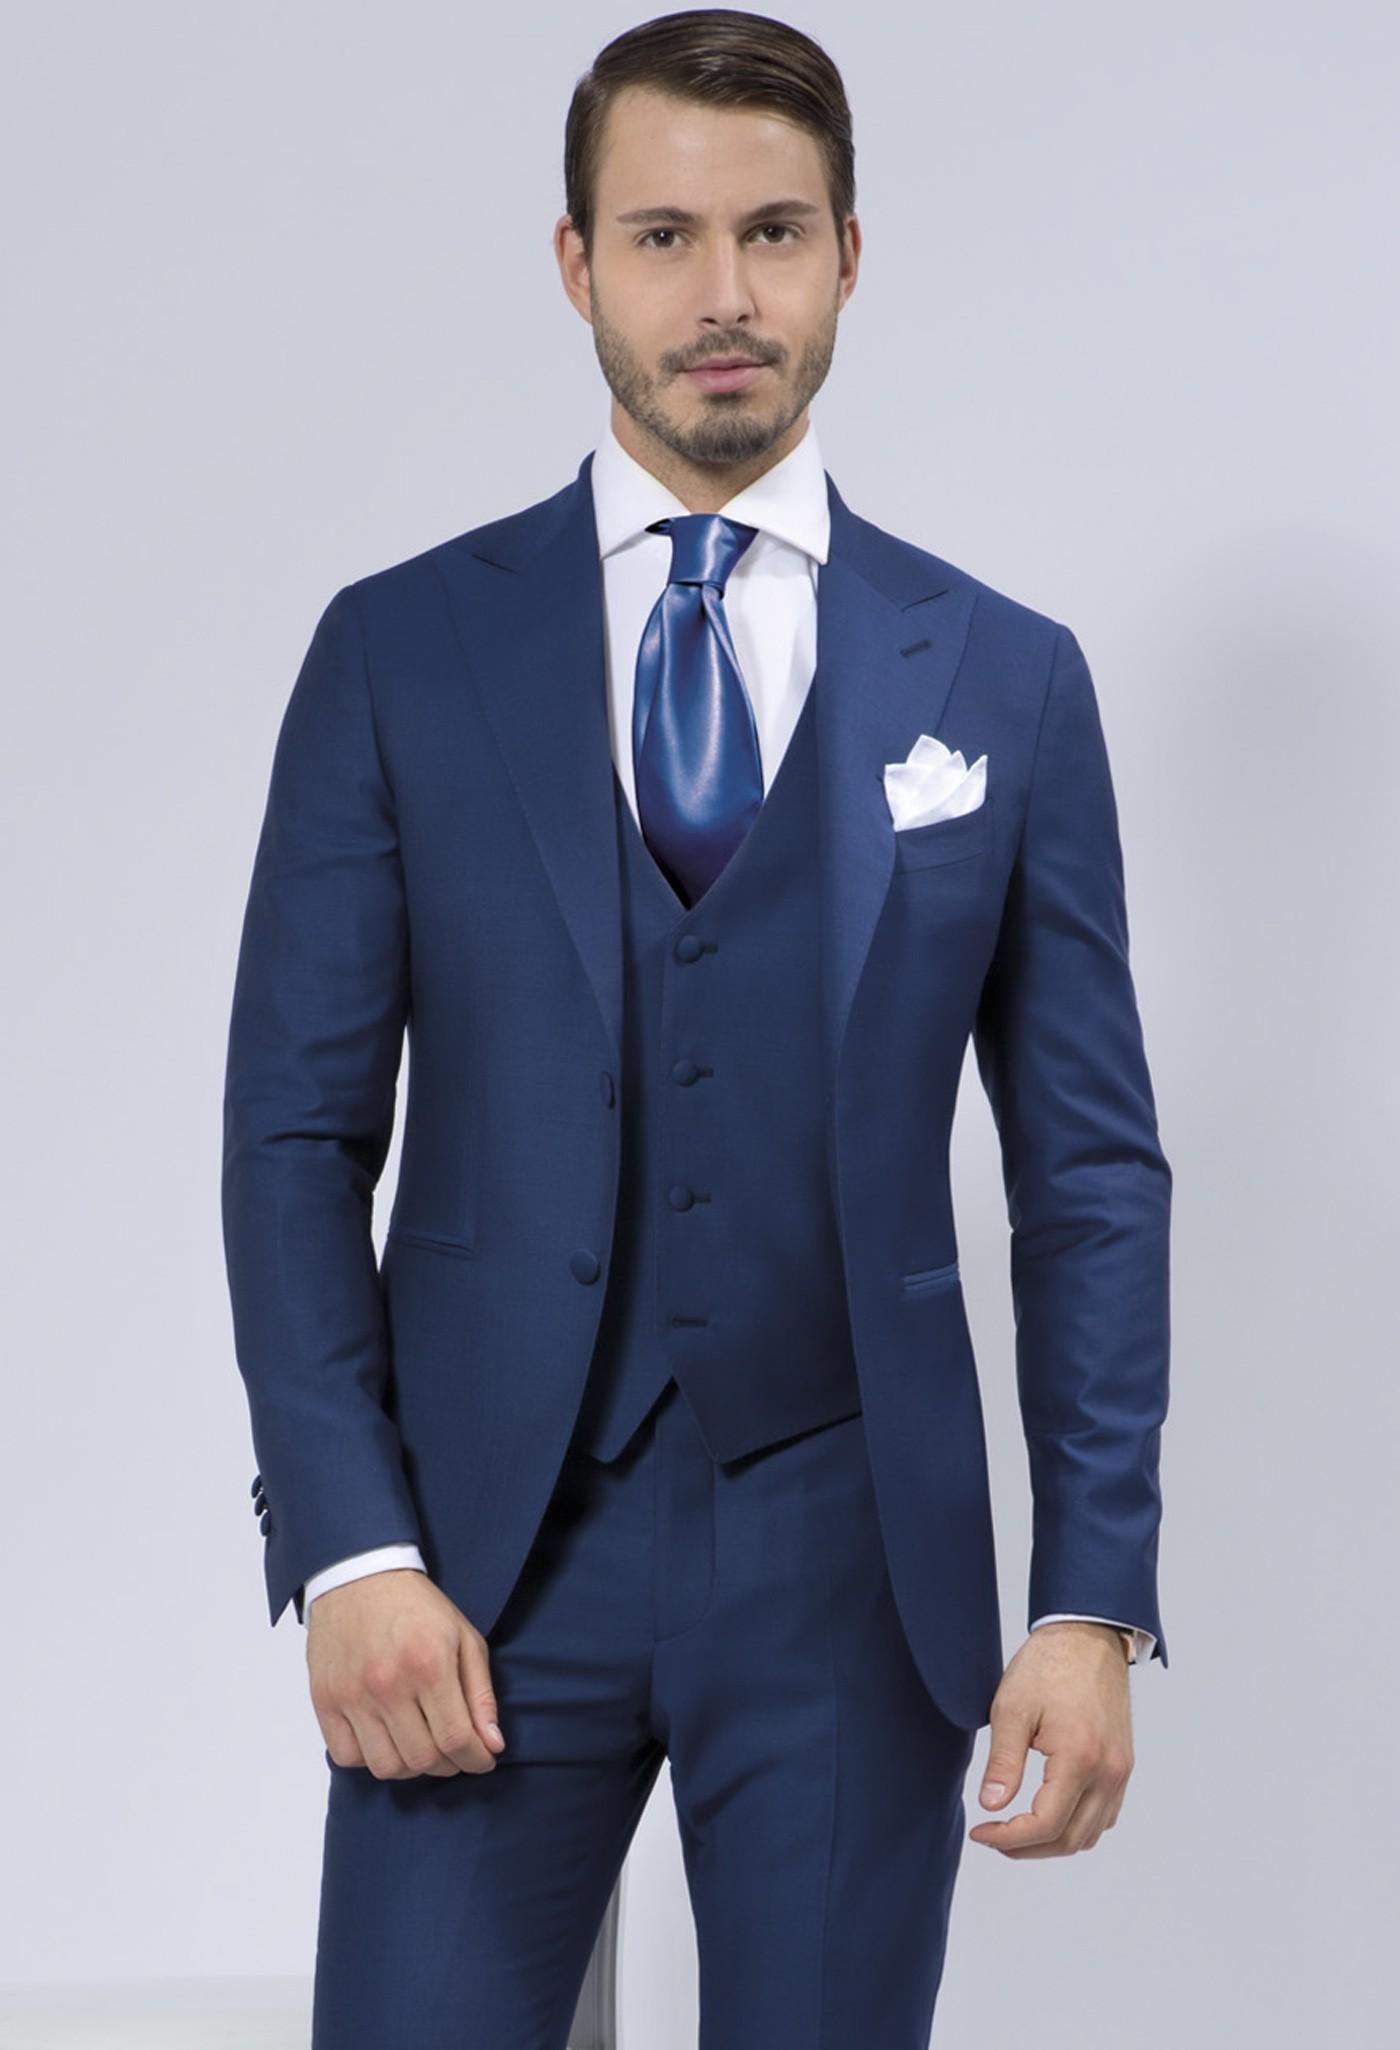 2016 italian suit design - Google Search | Wedding | Pinterest ...